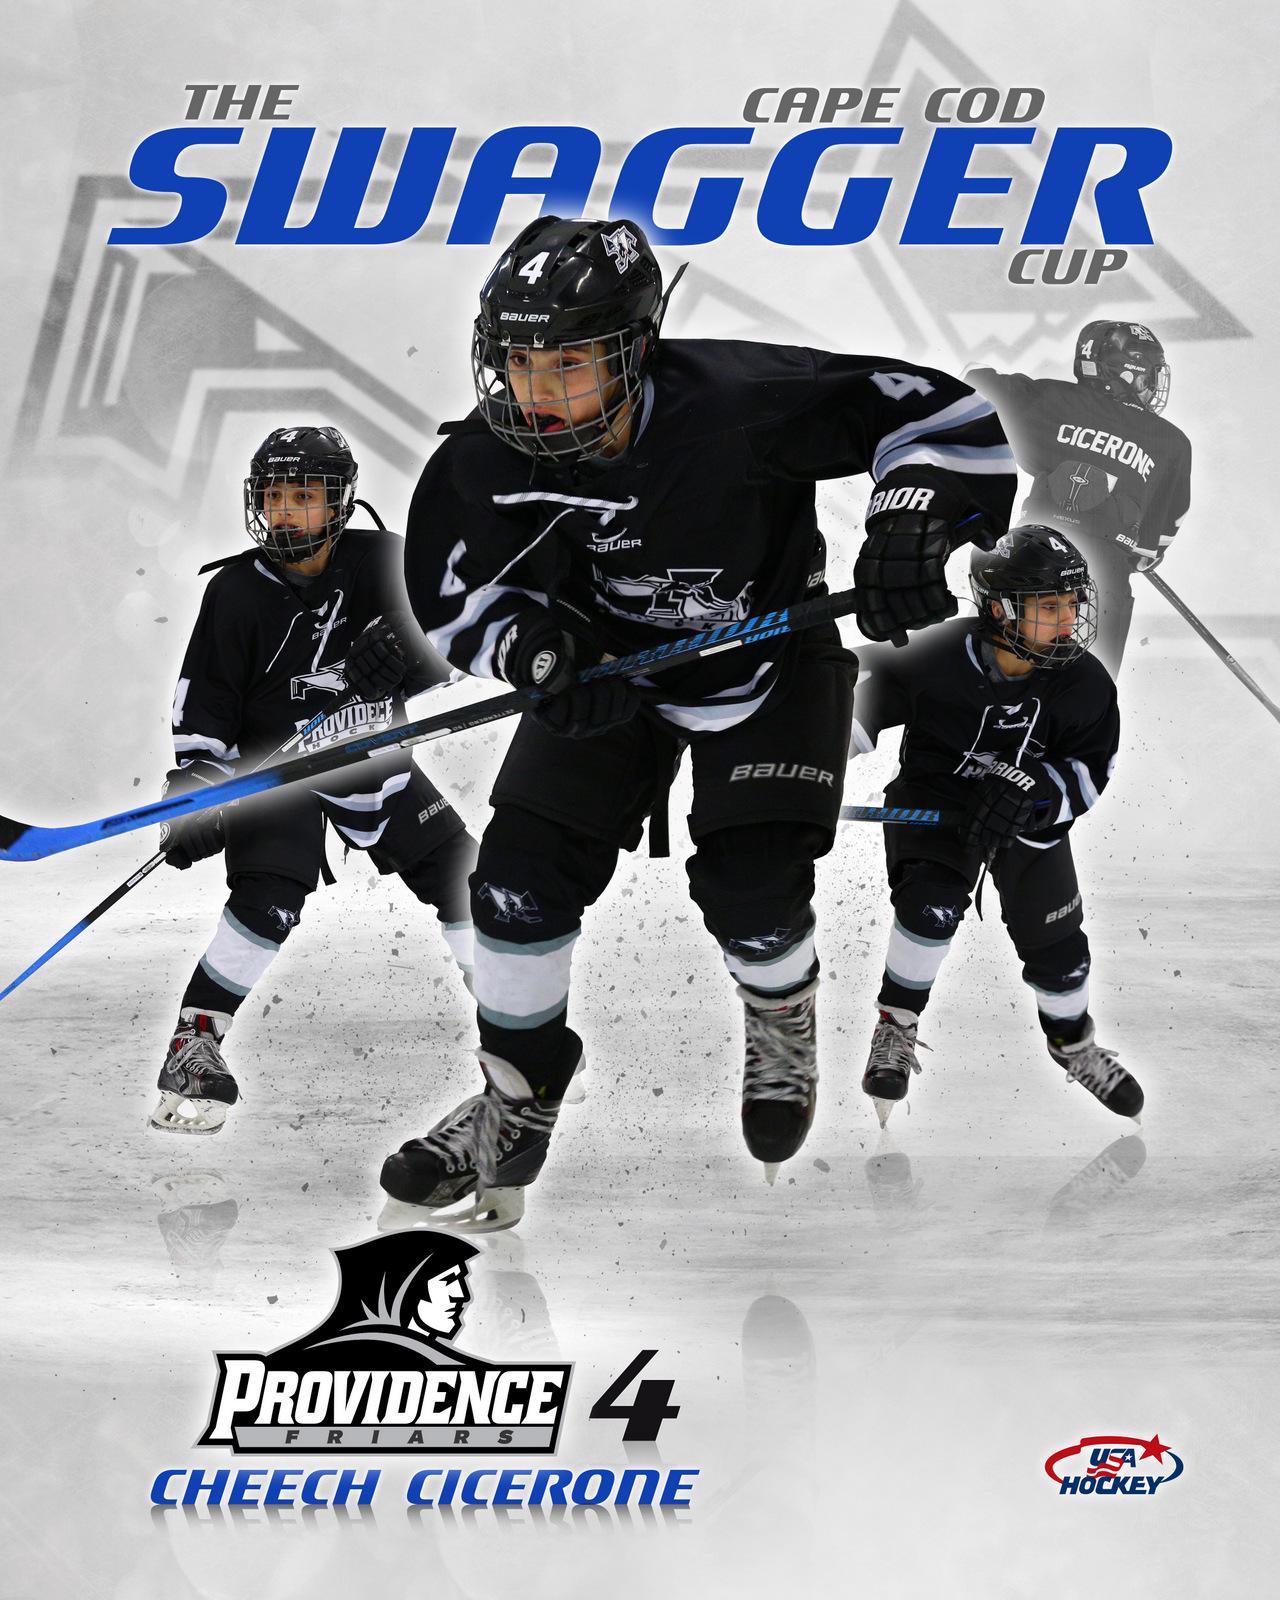 SilverPeak Studios Commemorative Poster Samples Action Sports Hockey Photography (4)